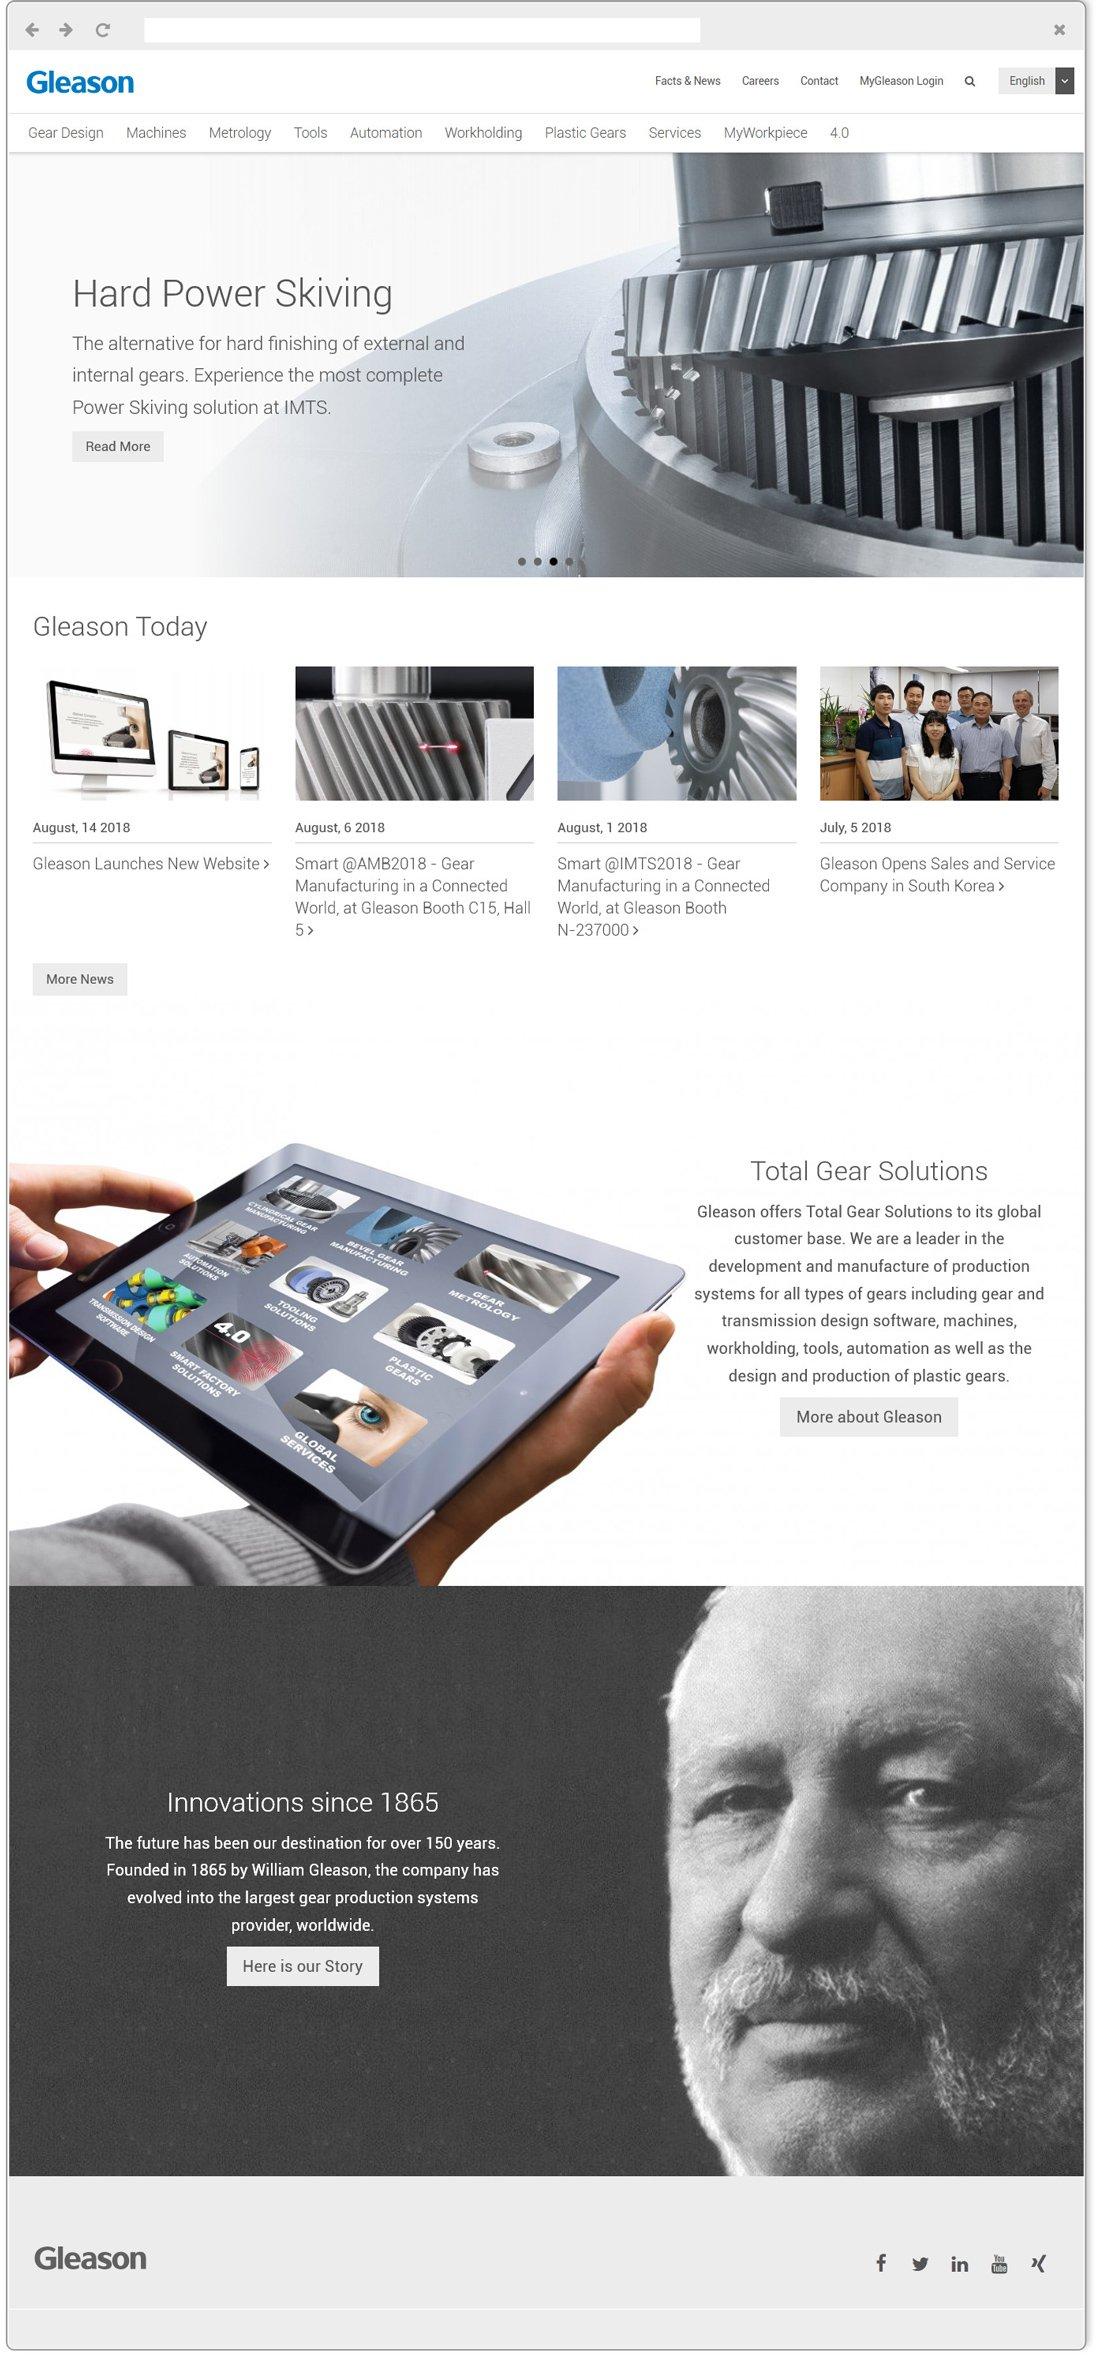 Gleason Home Page